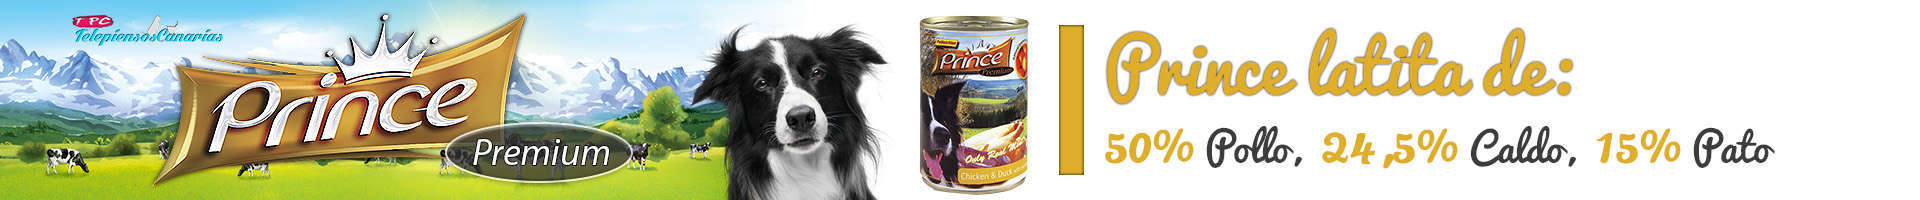 Prince latita de pollo (50%), pato (15%), mandarina y manzana